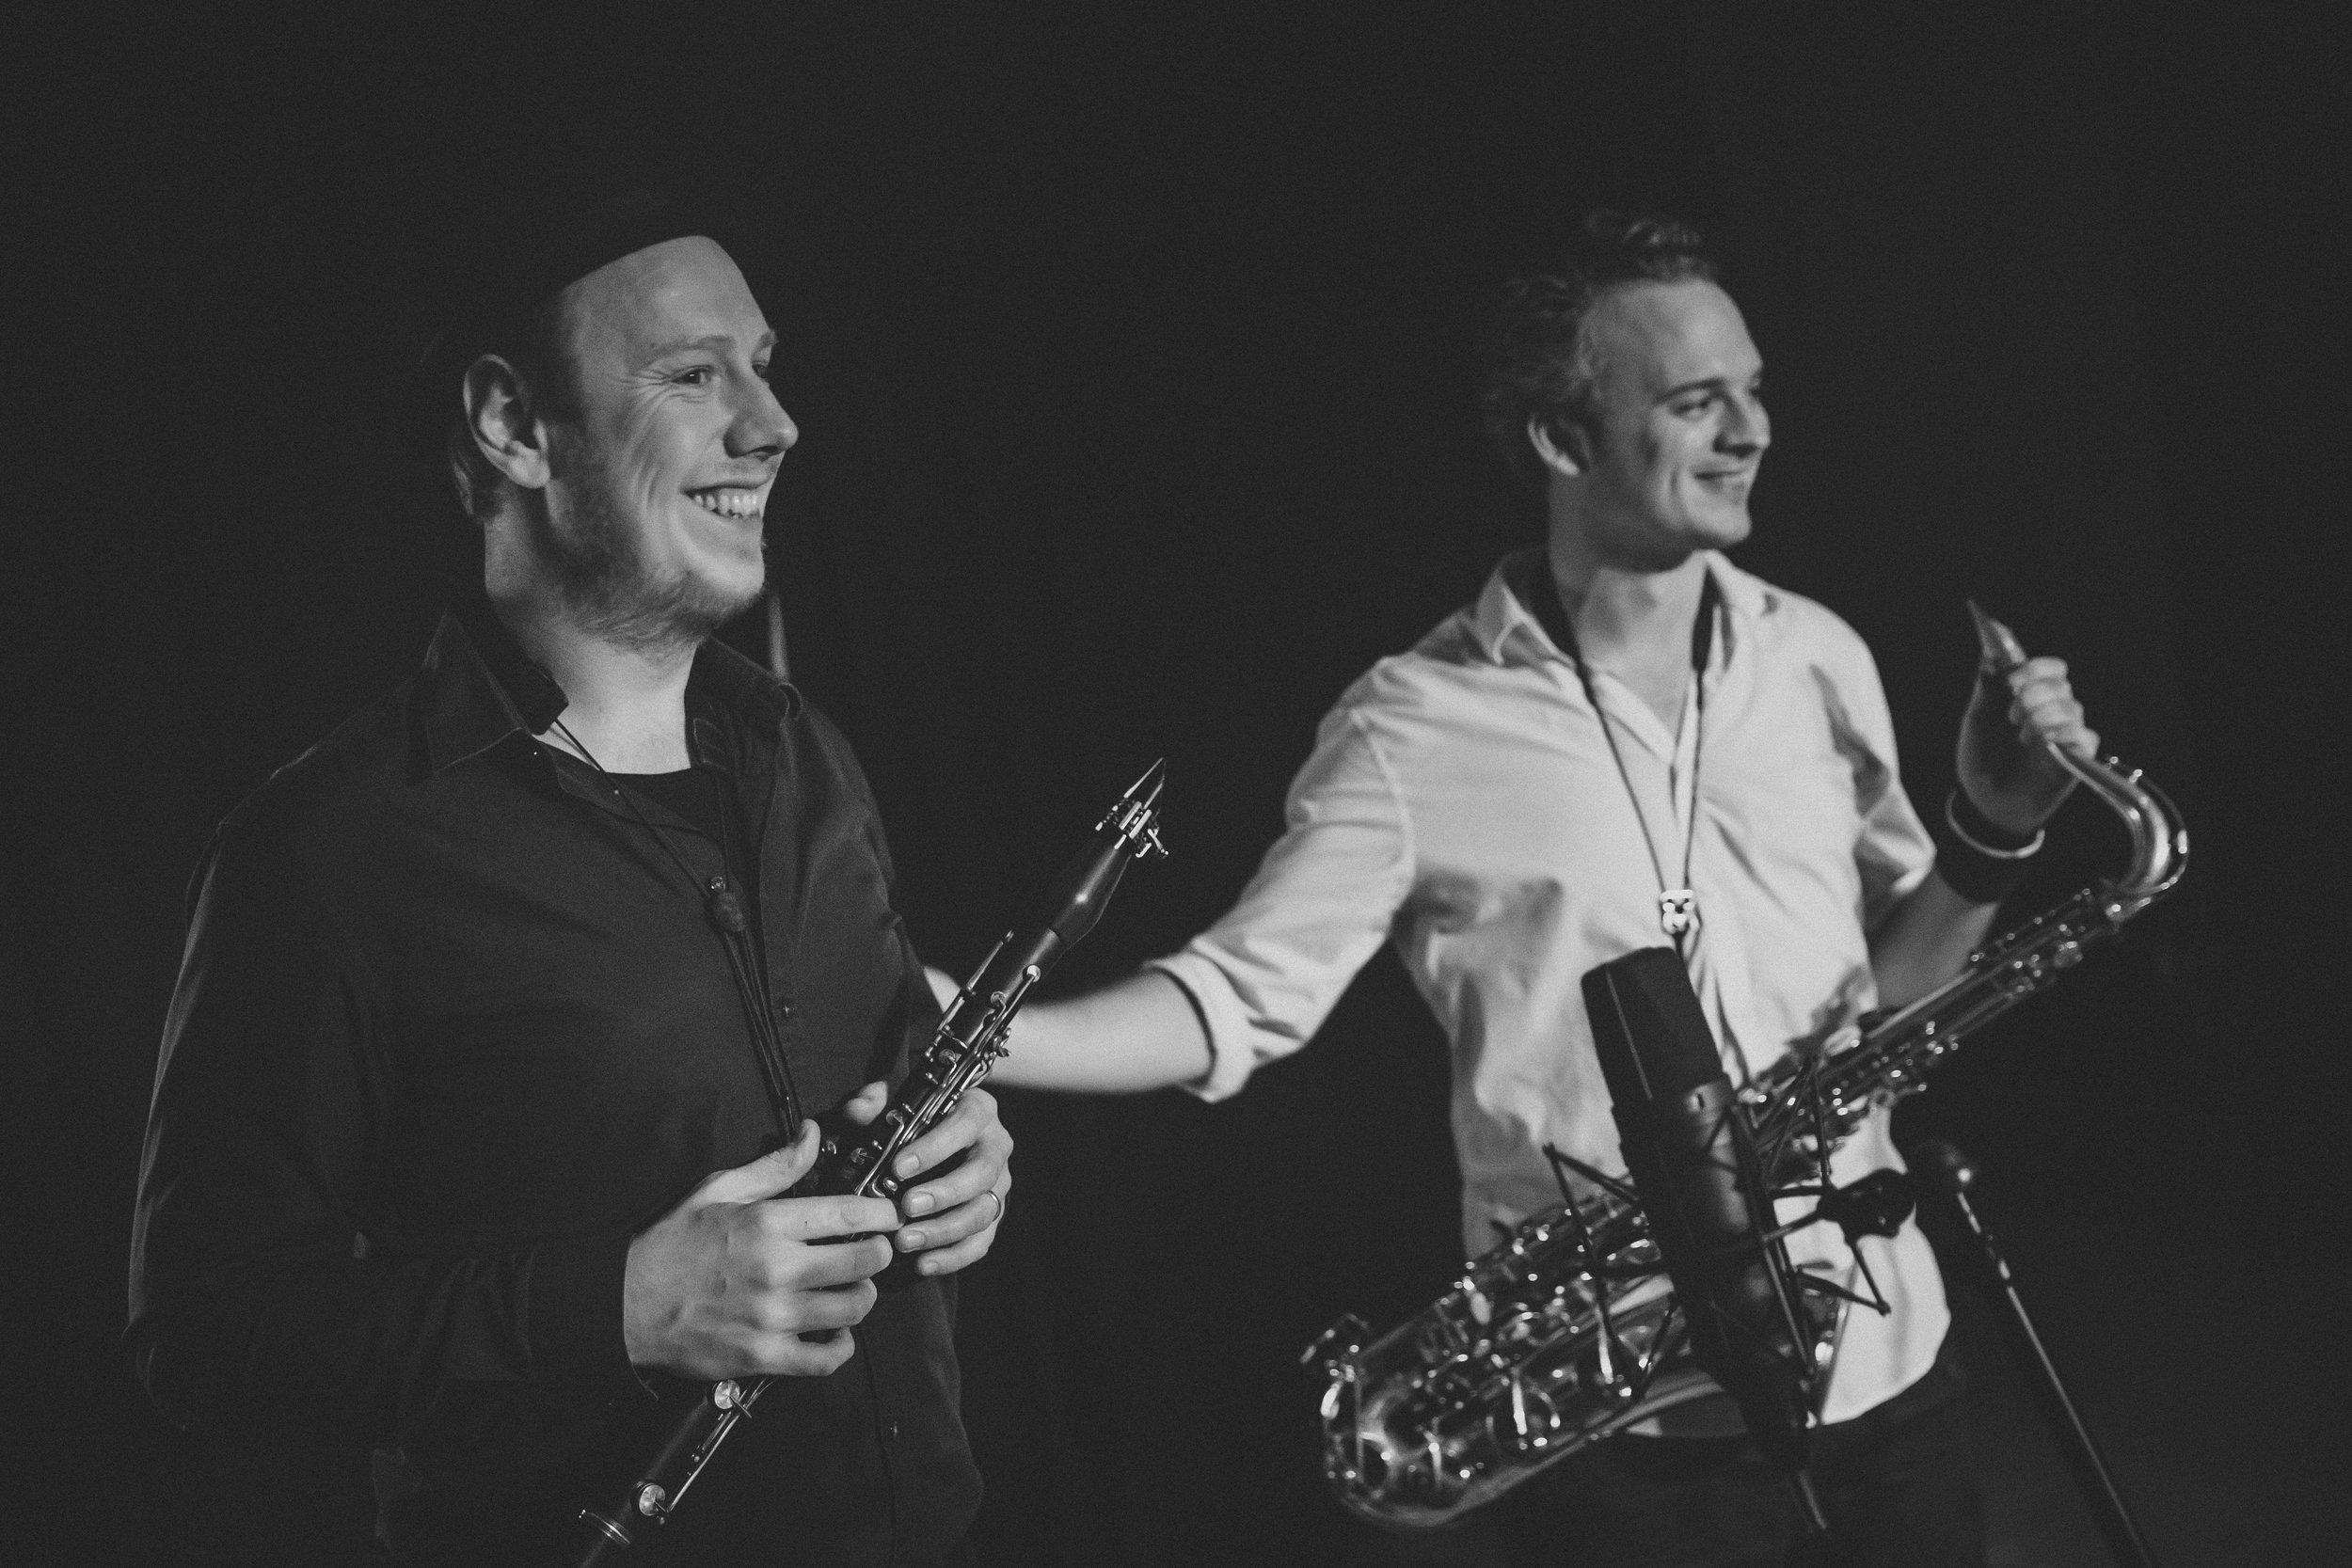 Old friends: Emil Goldschmidt, clarinet, left, and Lukas Rande, saxophone.